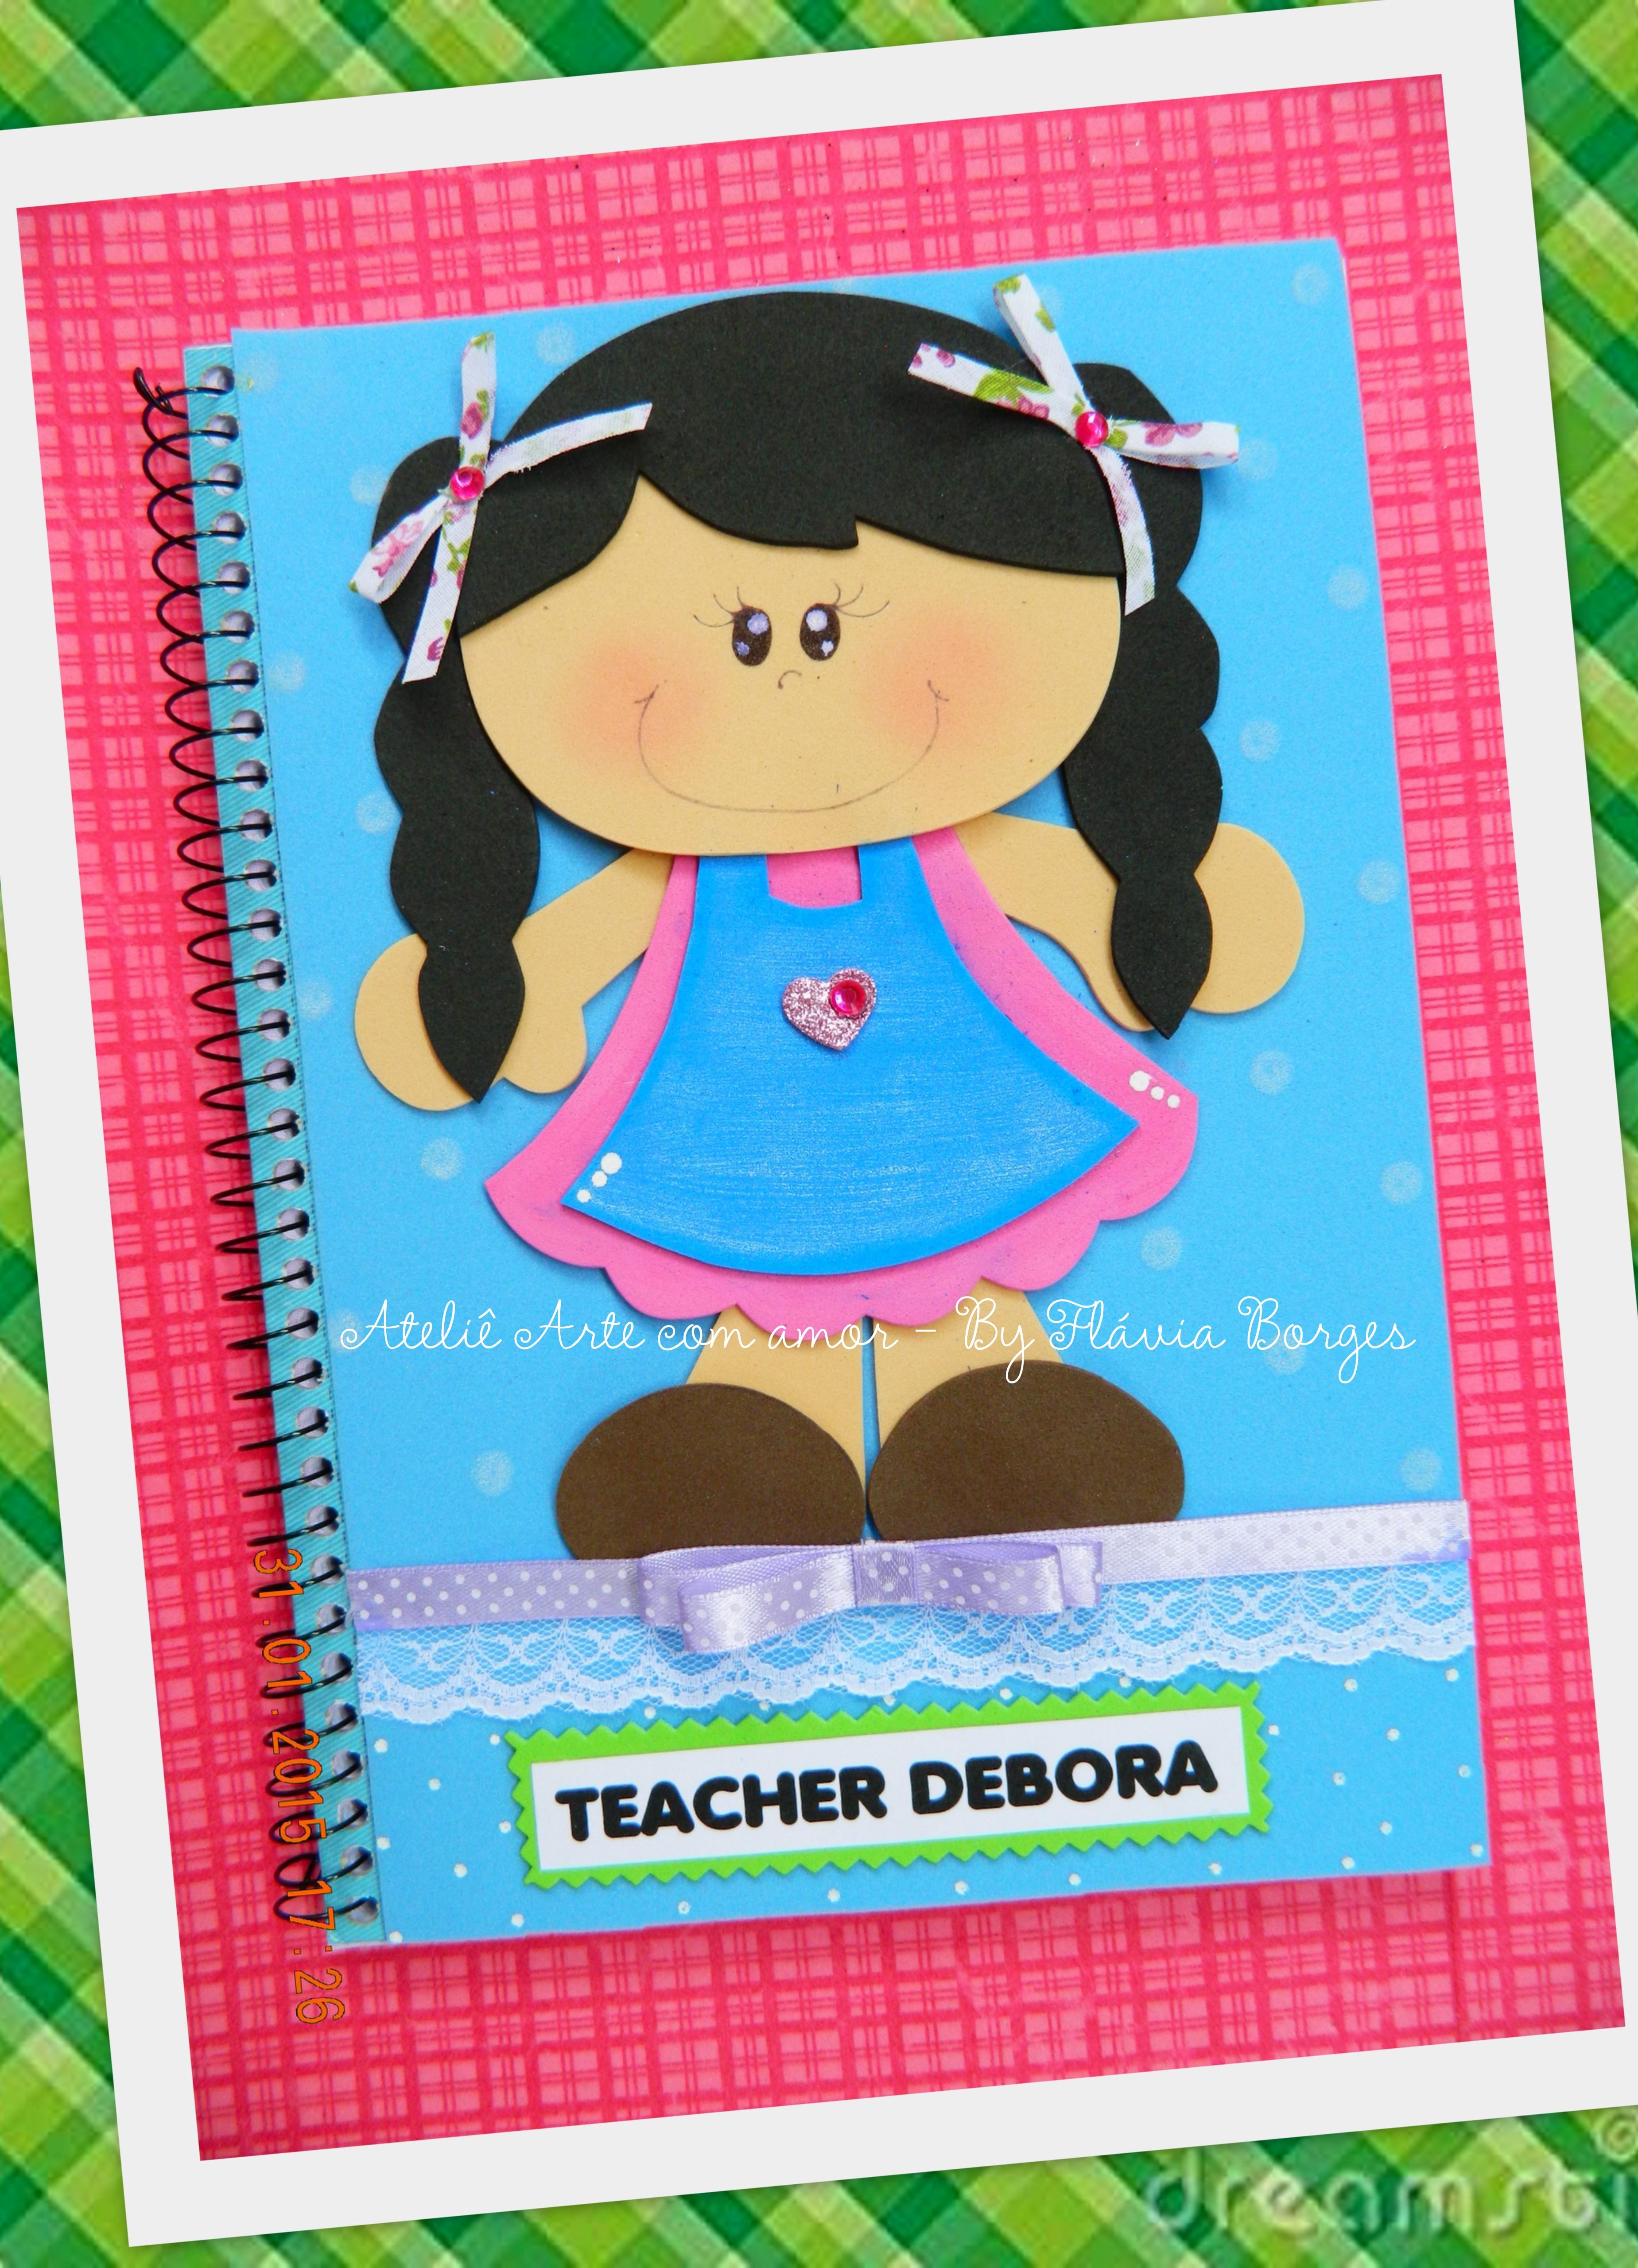 de aula decoracao kit para decoracao de sala de aula cartaz kit para ...